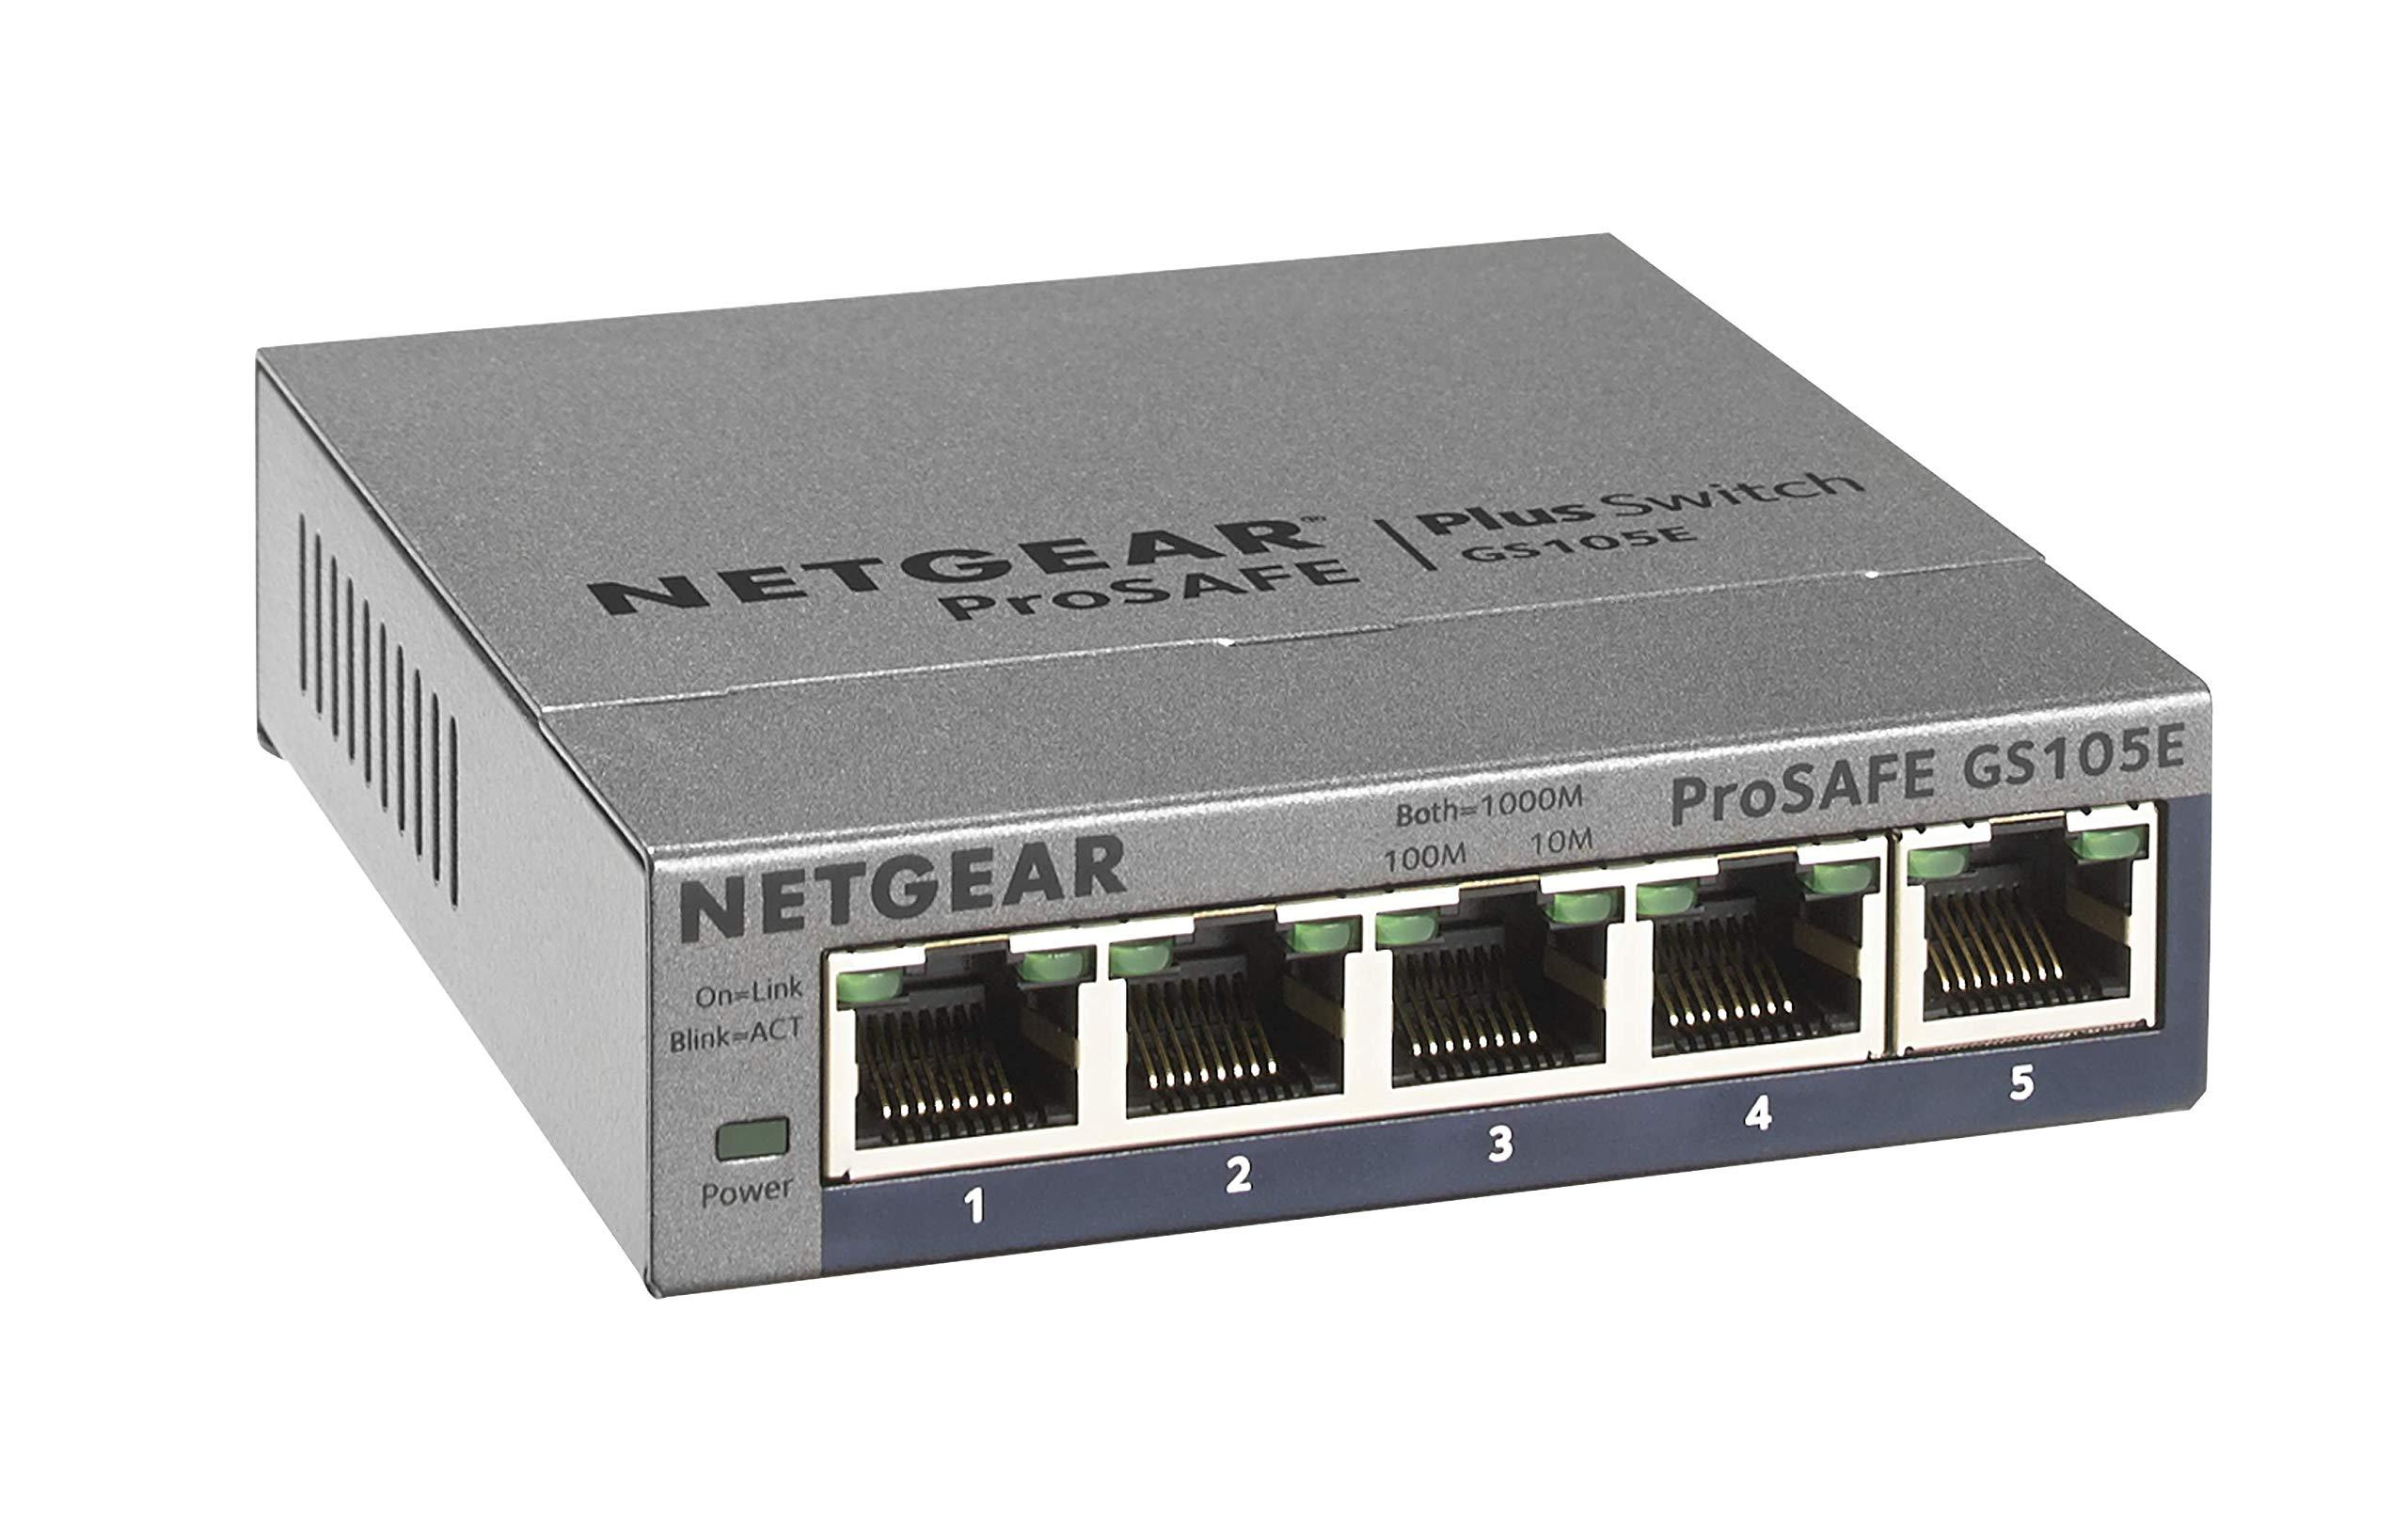 NETGEAR 5-Port Gigabit Ethernet Plus Switch (GS105Ev2) - Managed, Desktop or Wall Mount, and Limited Lifetime Protection